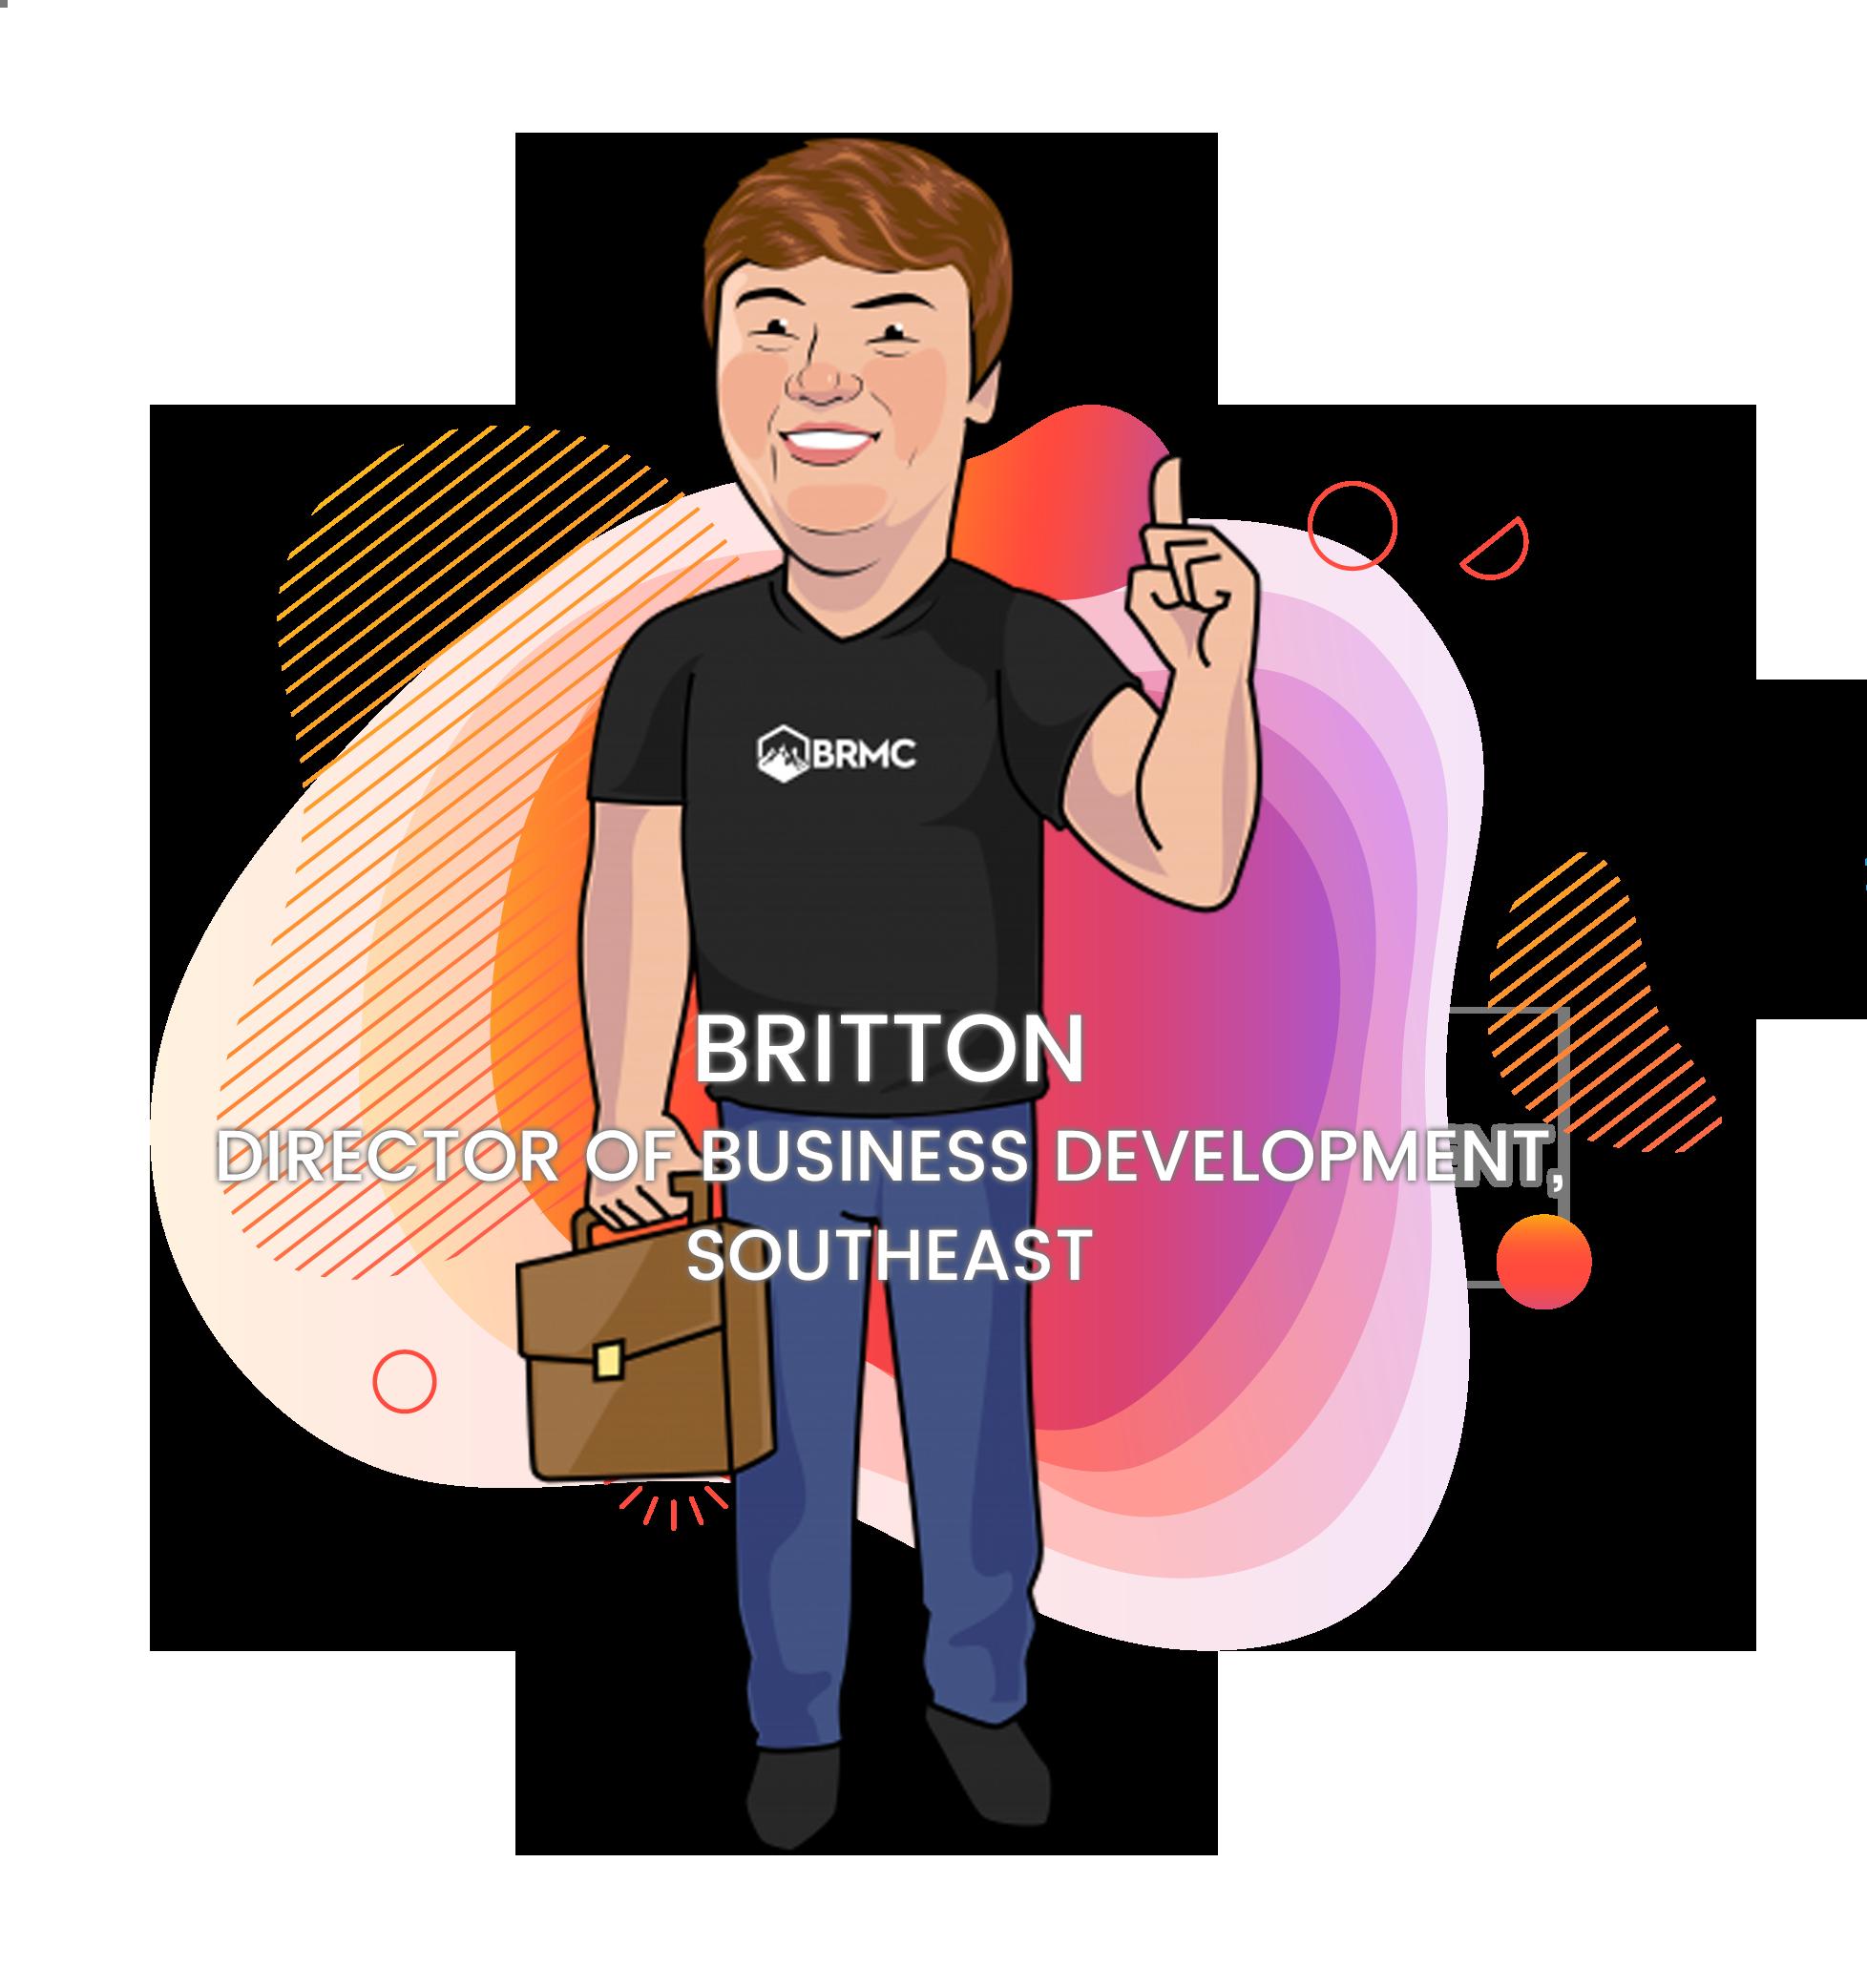 Britton, Director of Business Development, Southeast